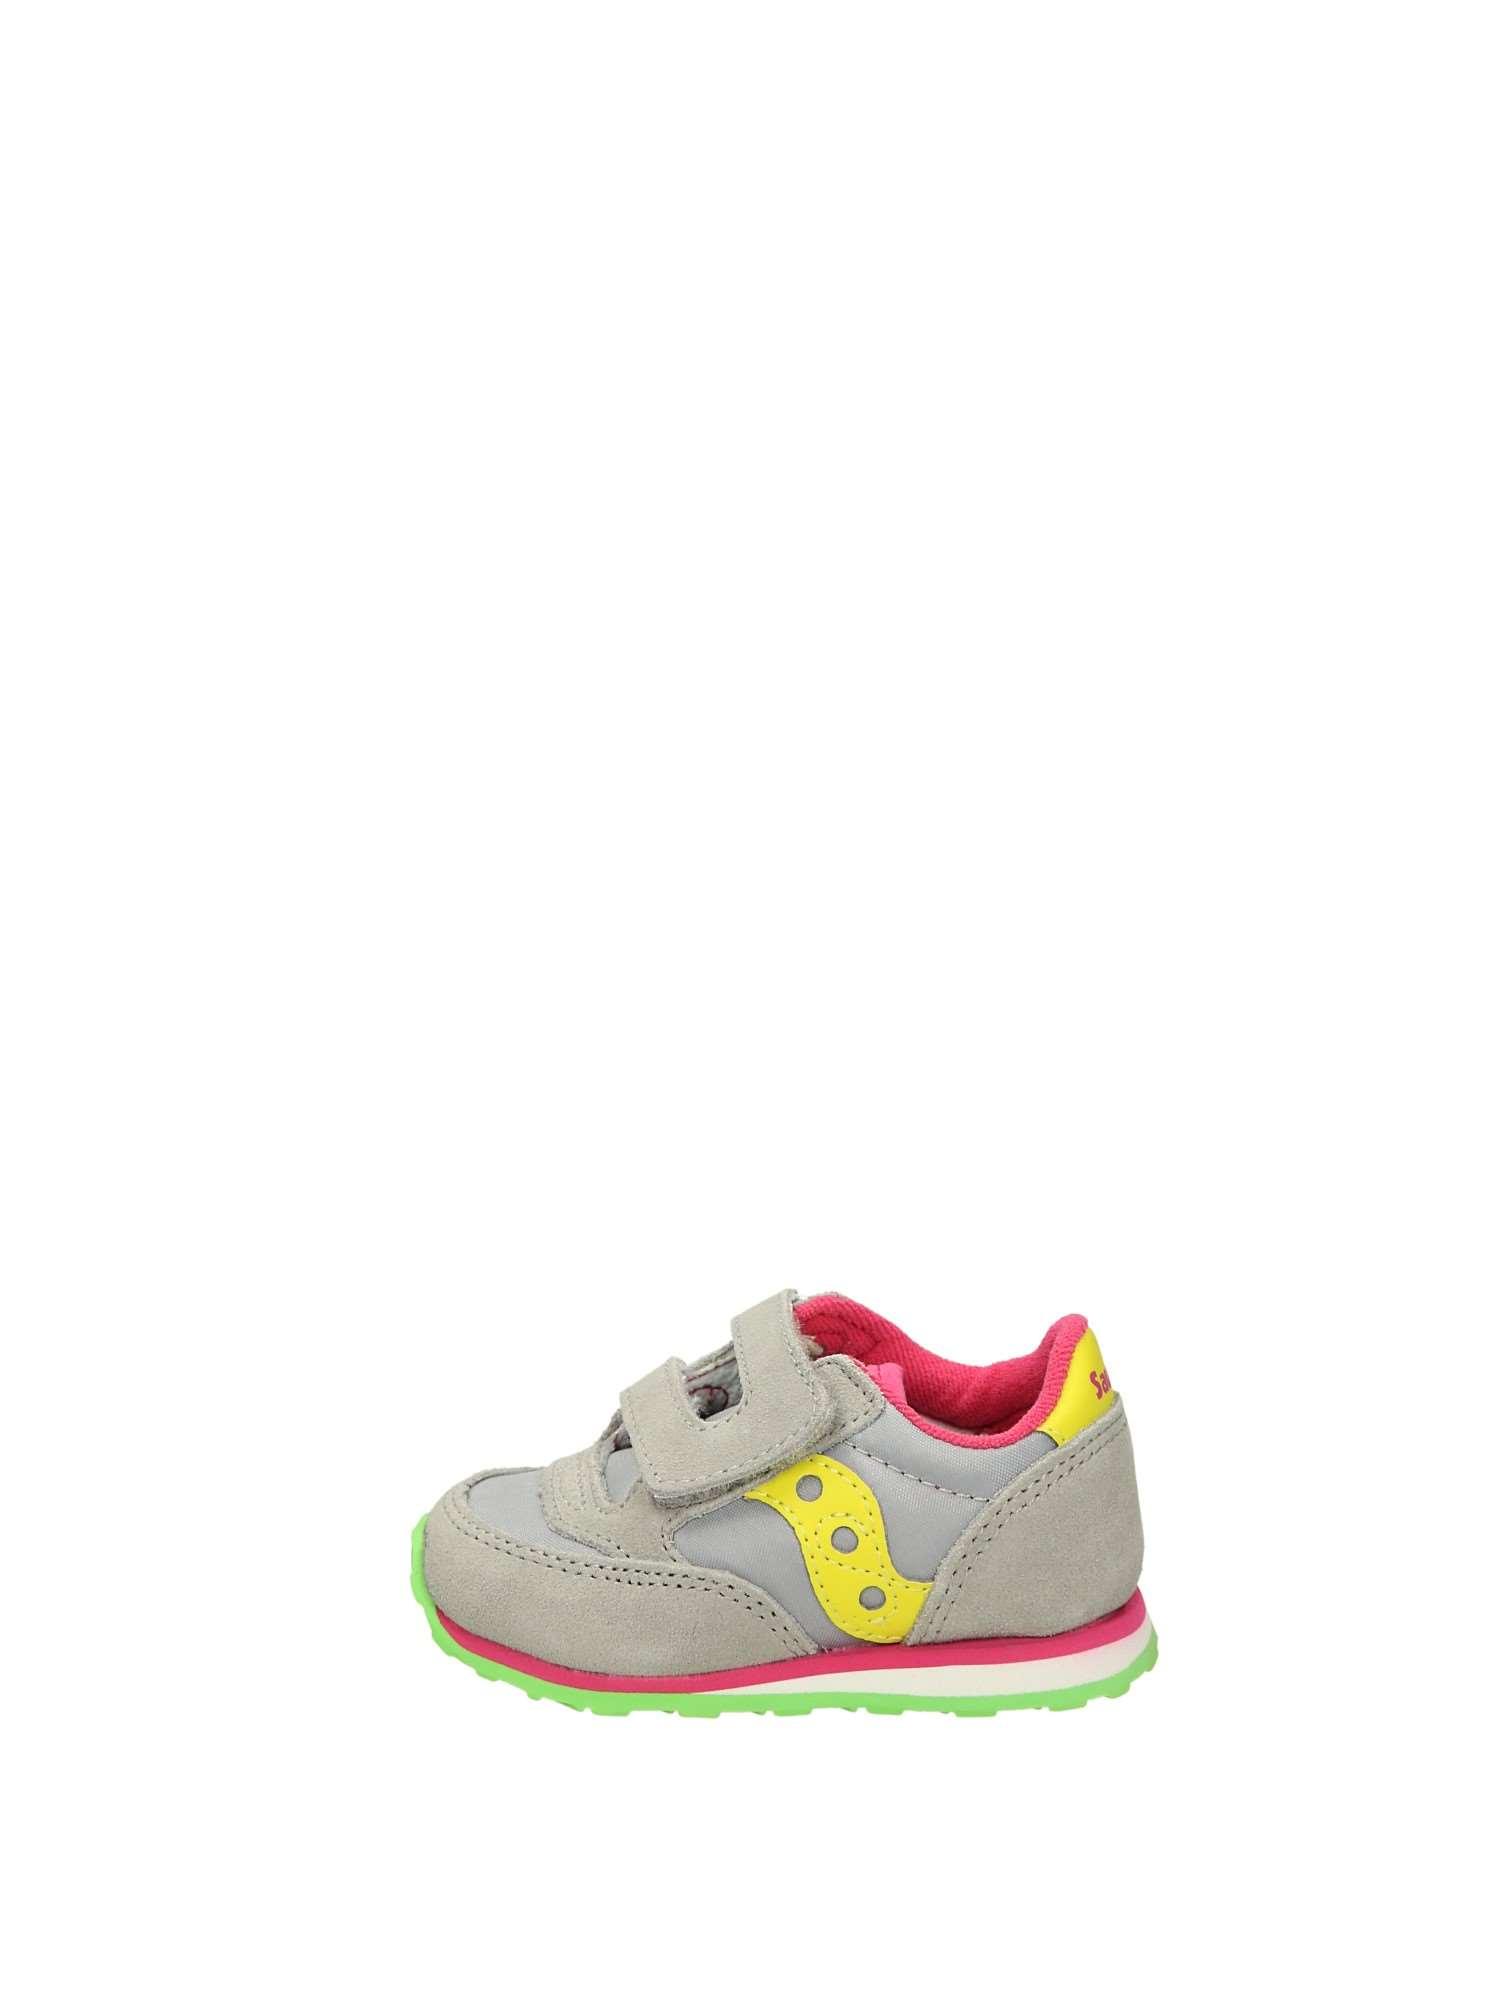 Saucony JAZZ BABY Grigio Giallo Scarpe Bambina Sneakers ecae7ea227d